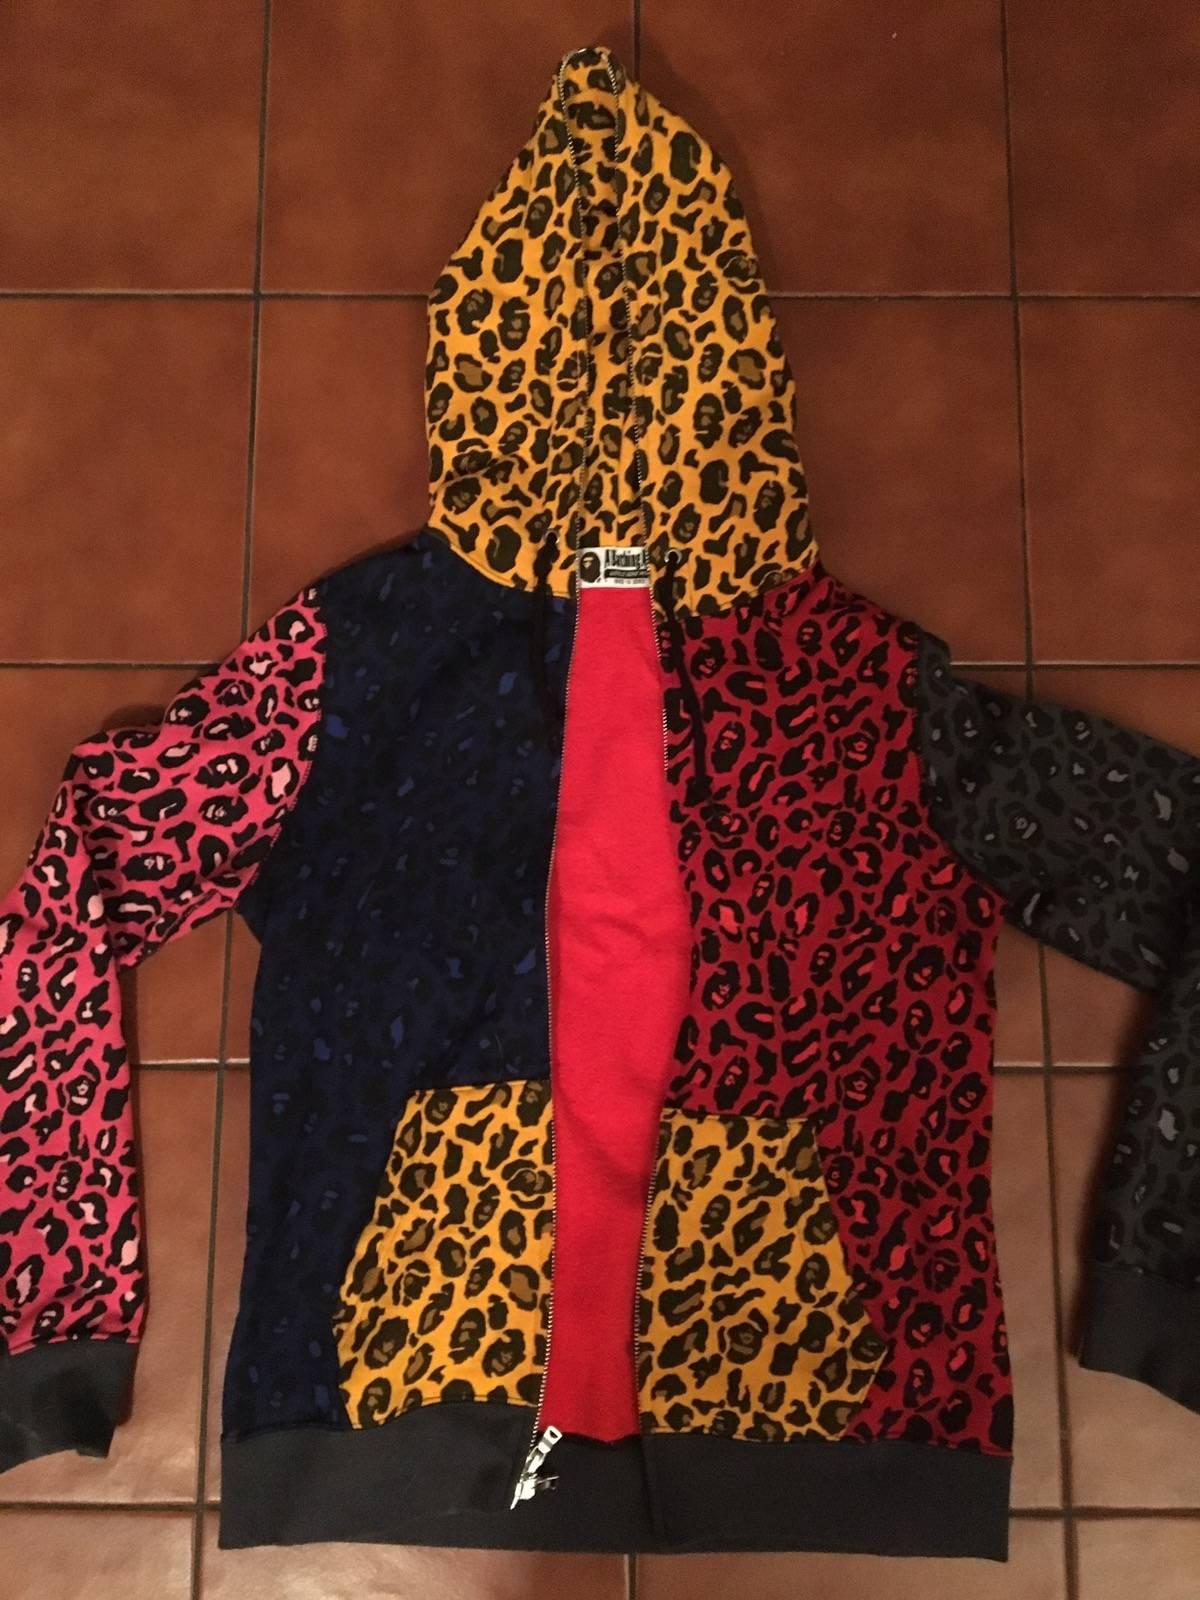 78d0a2e498e79 Bape Leopard Camo Print Full Zip Hoodie | Grailed